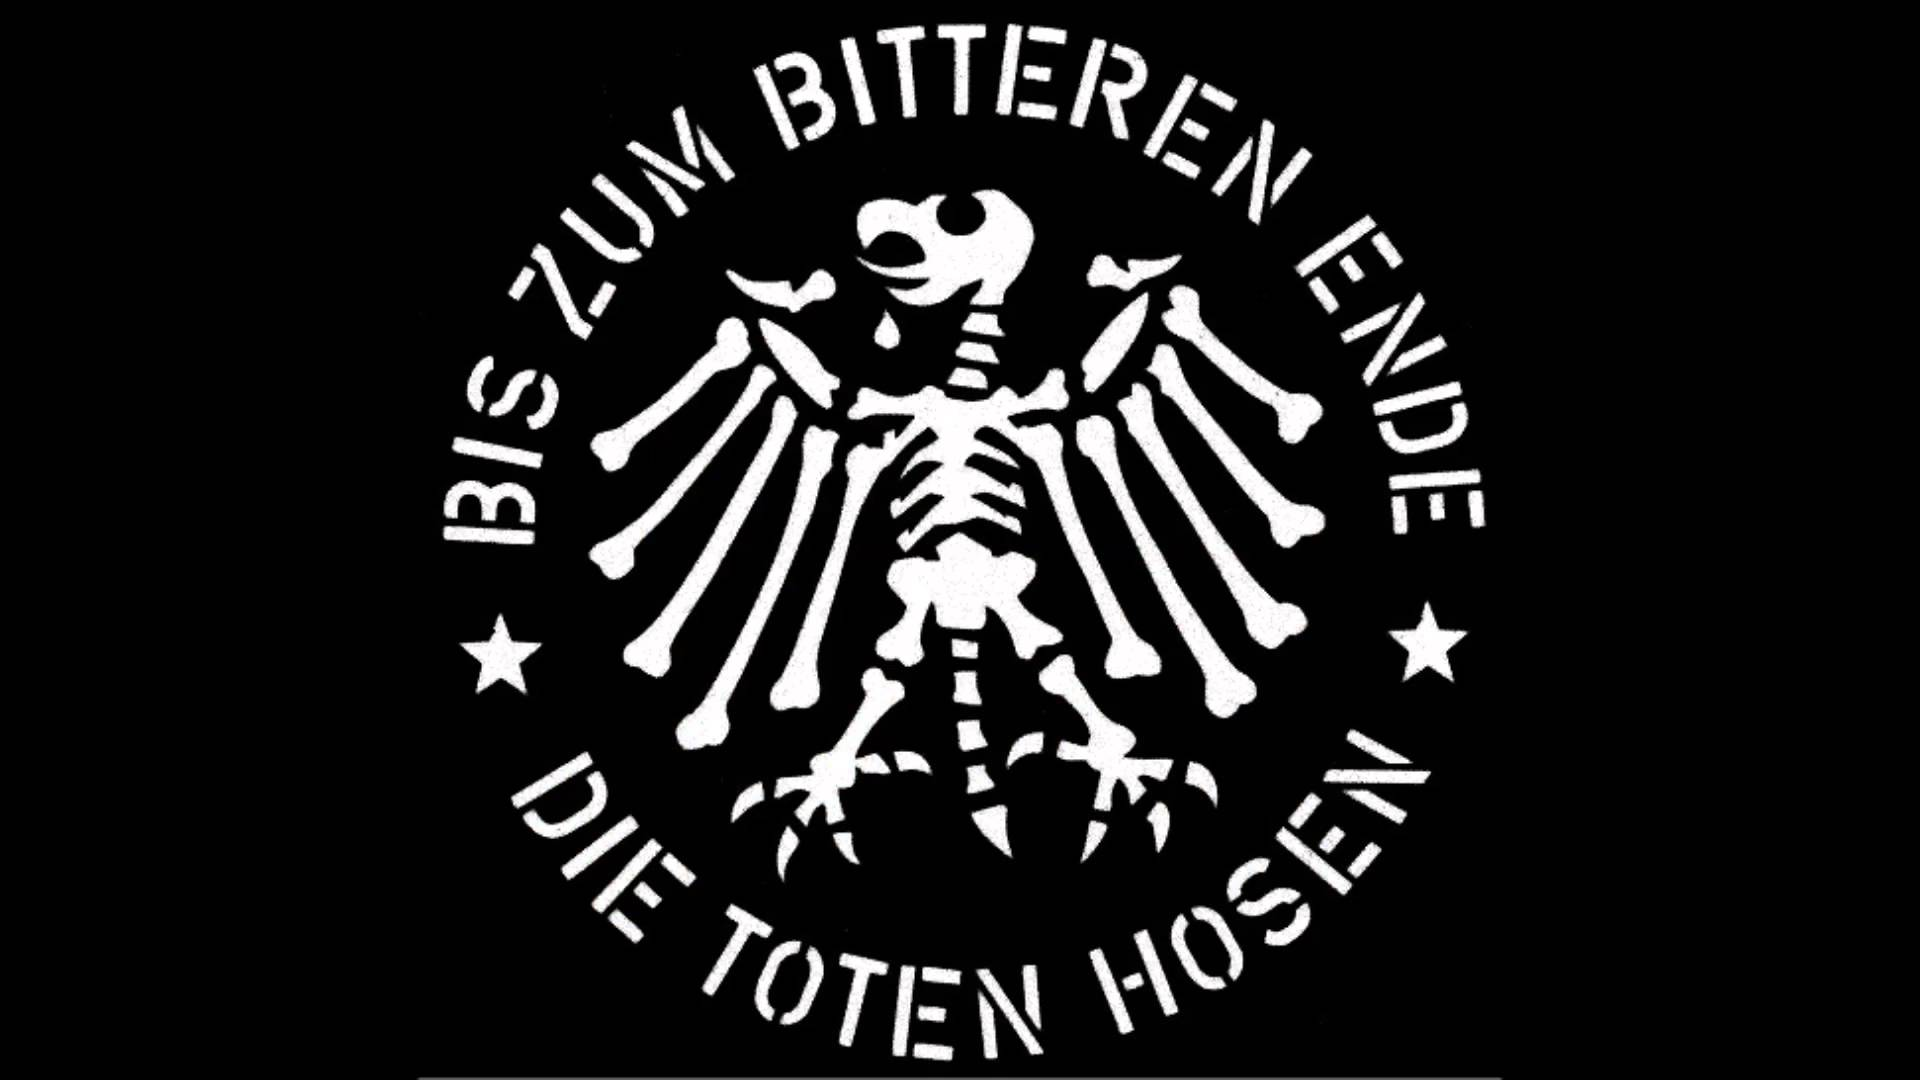 Toten Hosen Logo